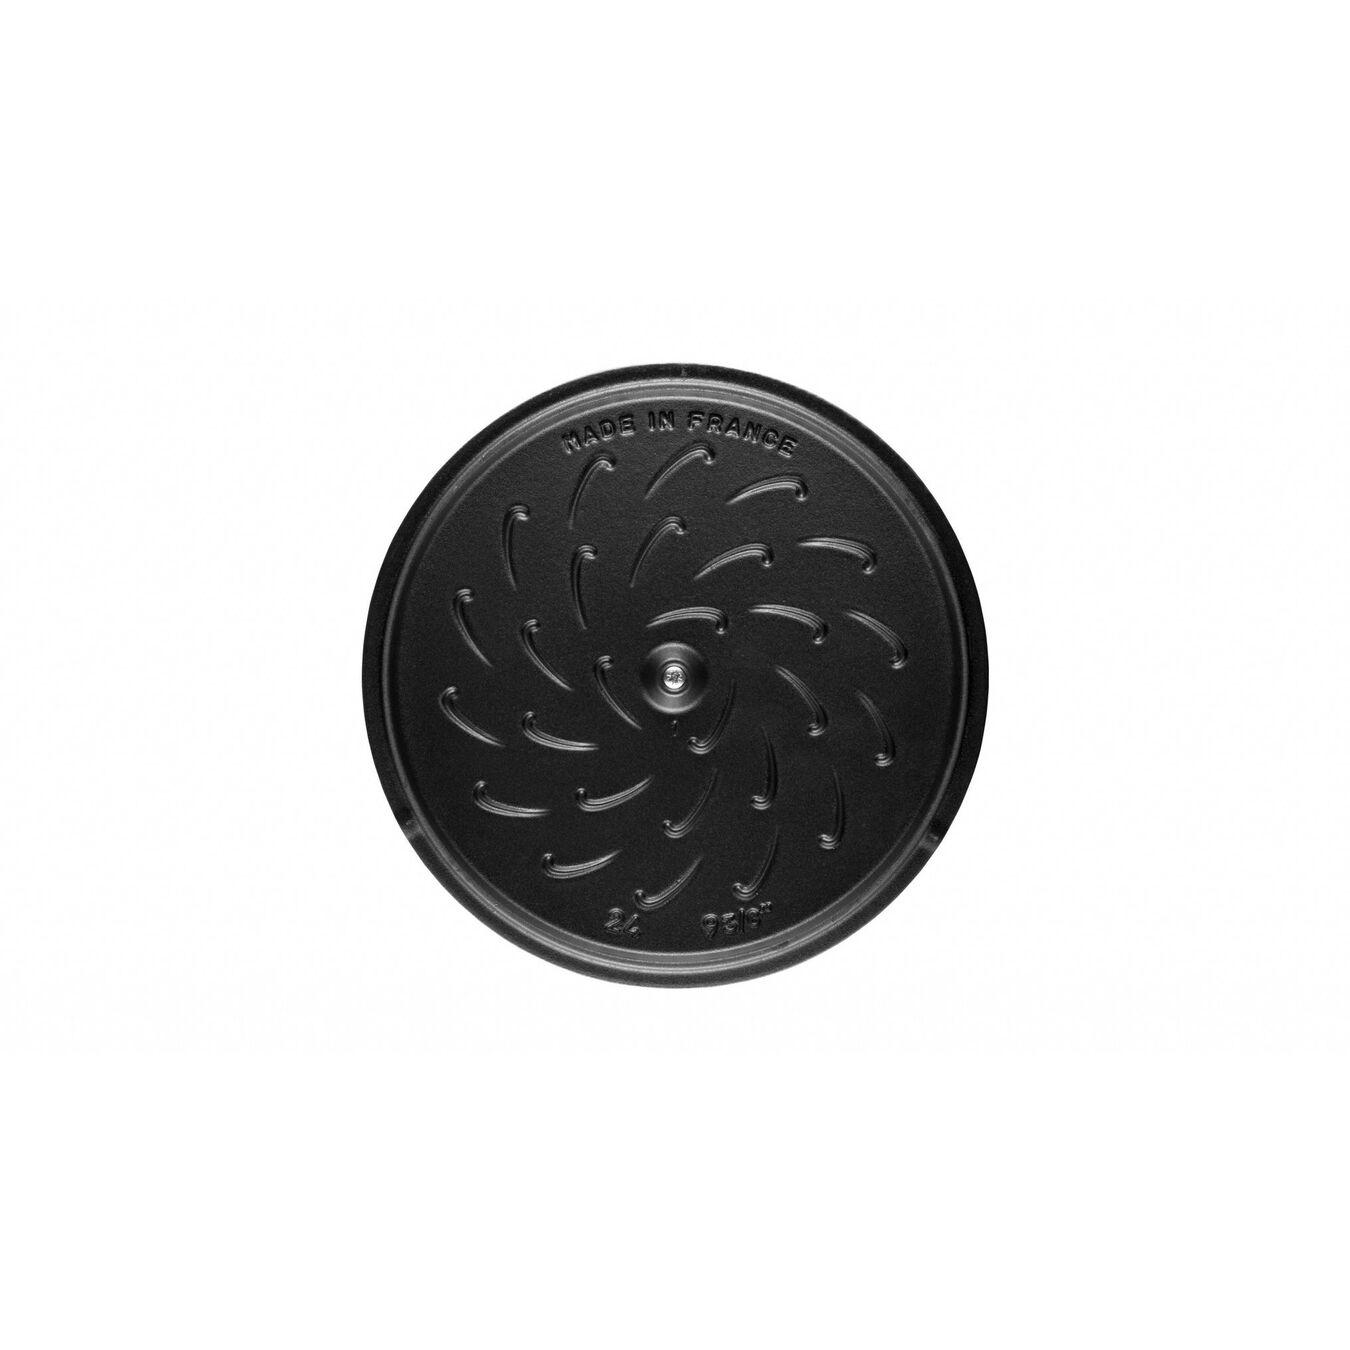 Sauteuse 24 cm, Fonte,,large 7